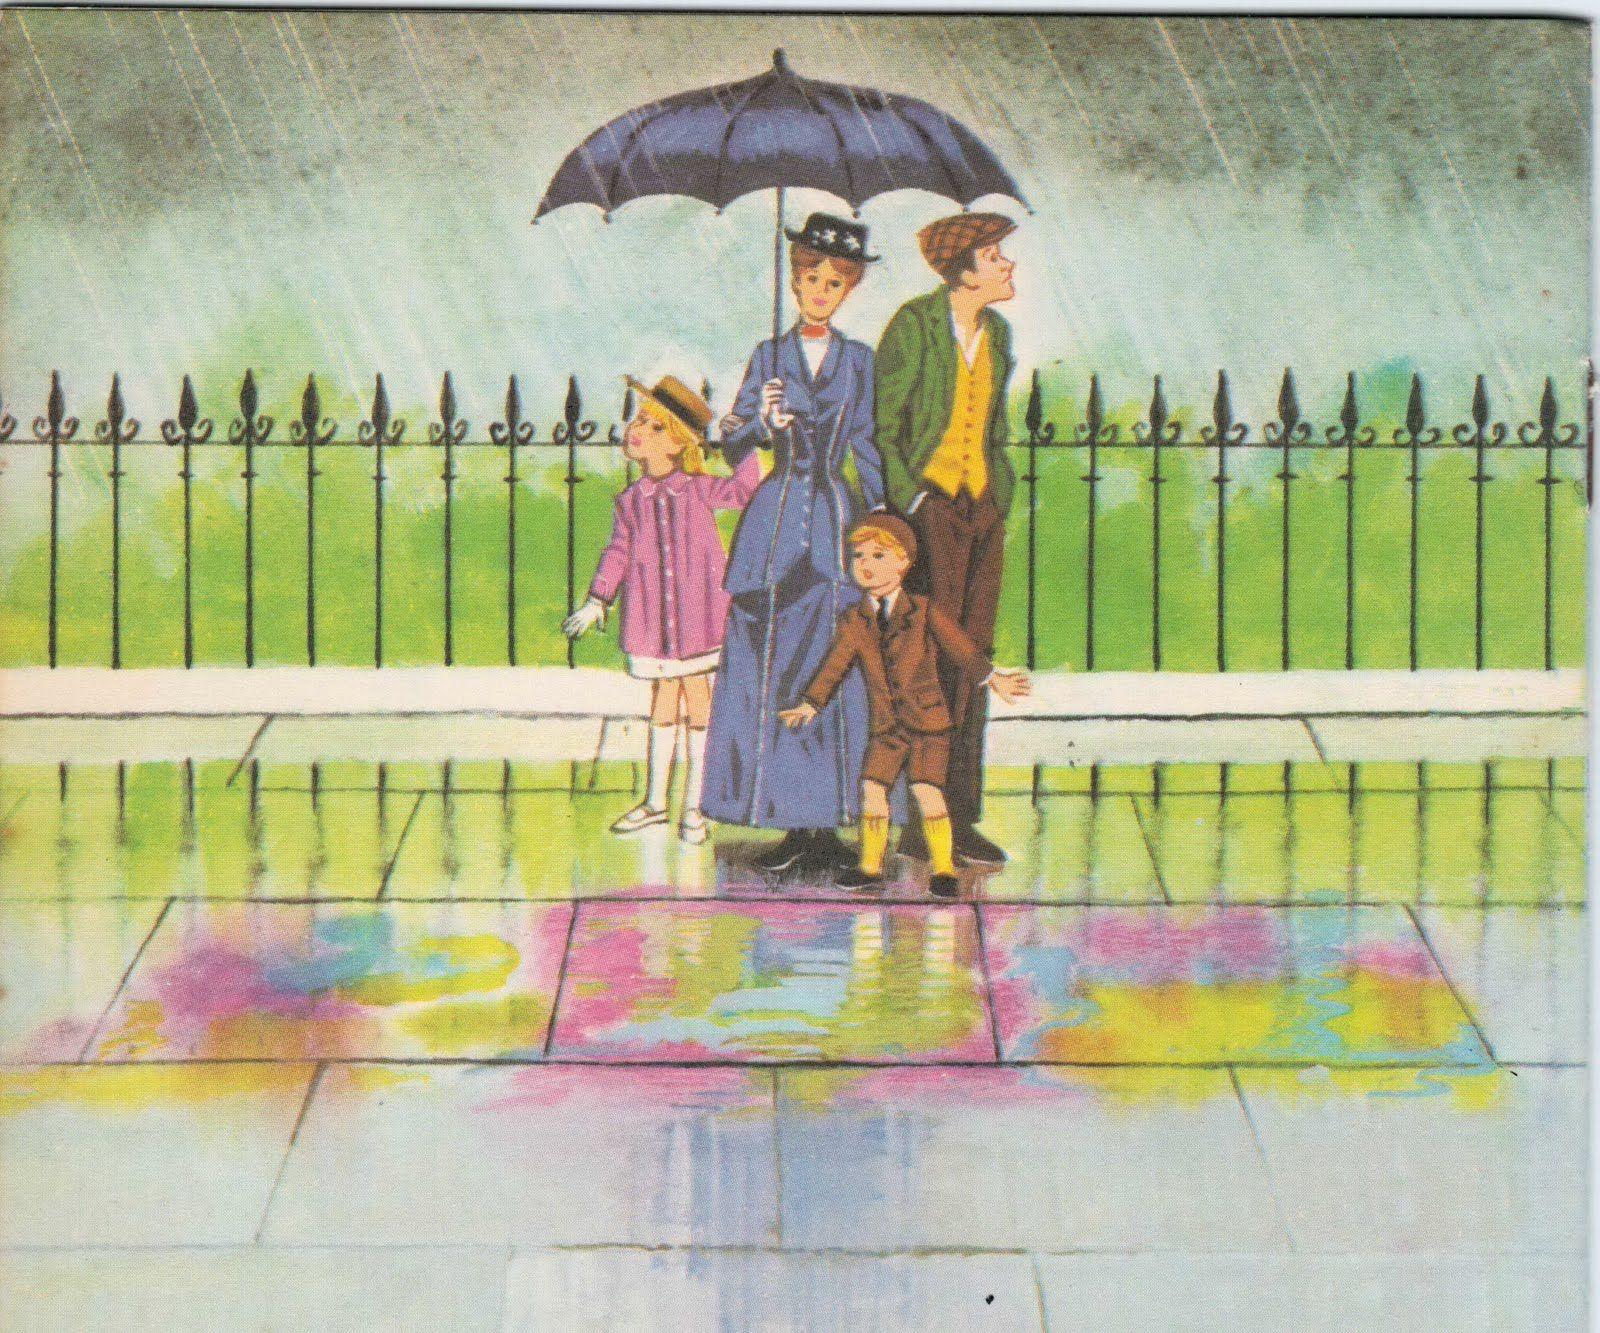 Mary Poppins Dibujos Para Colorear: Mary Poppins, Libros De